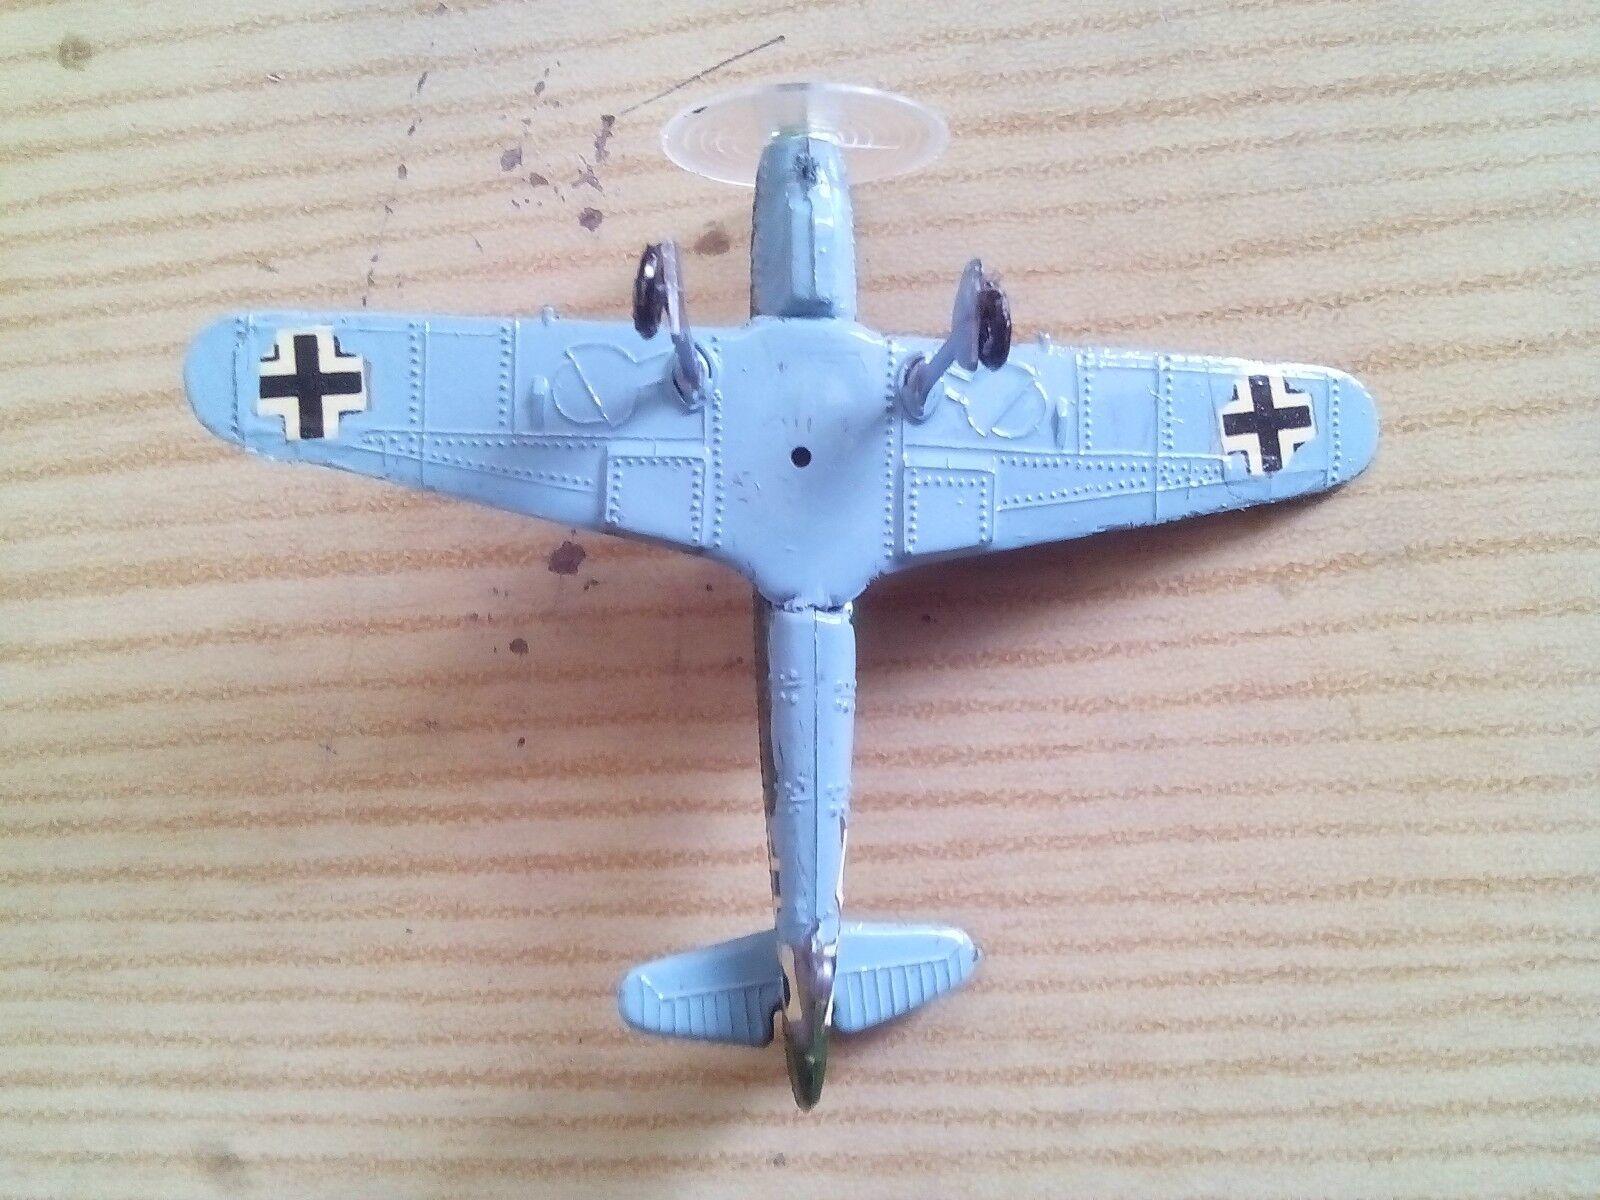 Eko Aviones - Messerschmitt ME. 109 109 109 Sin Caja - Lote 1 2bf0e1